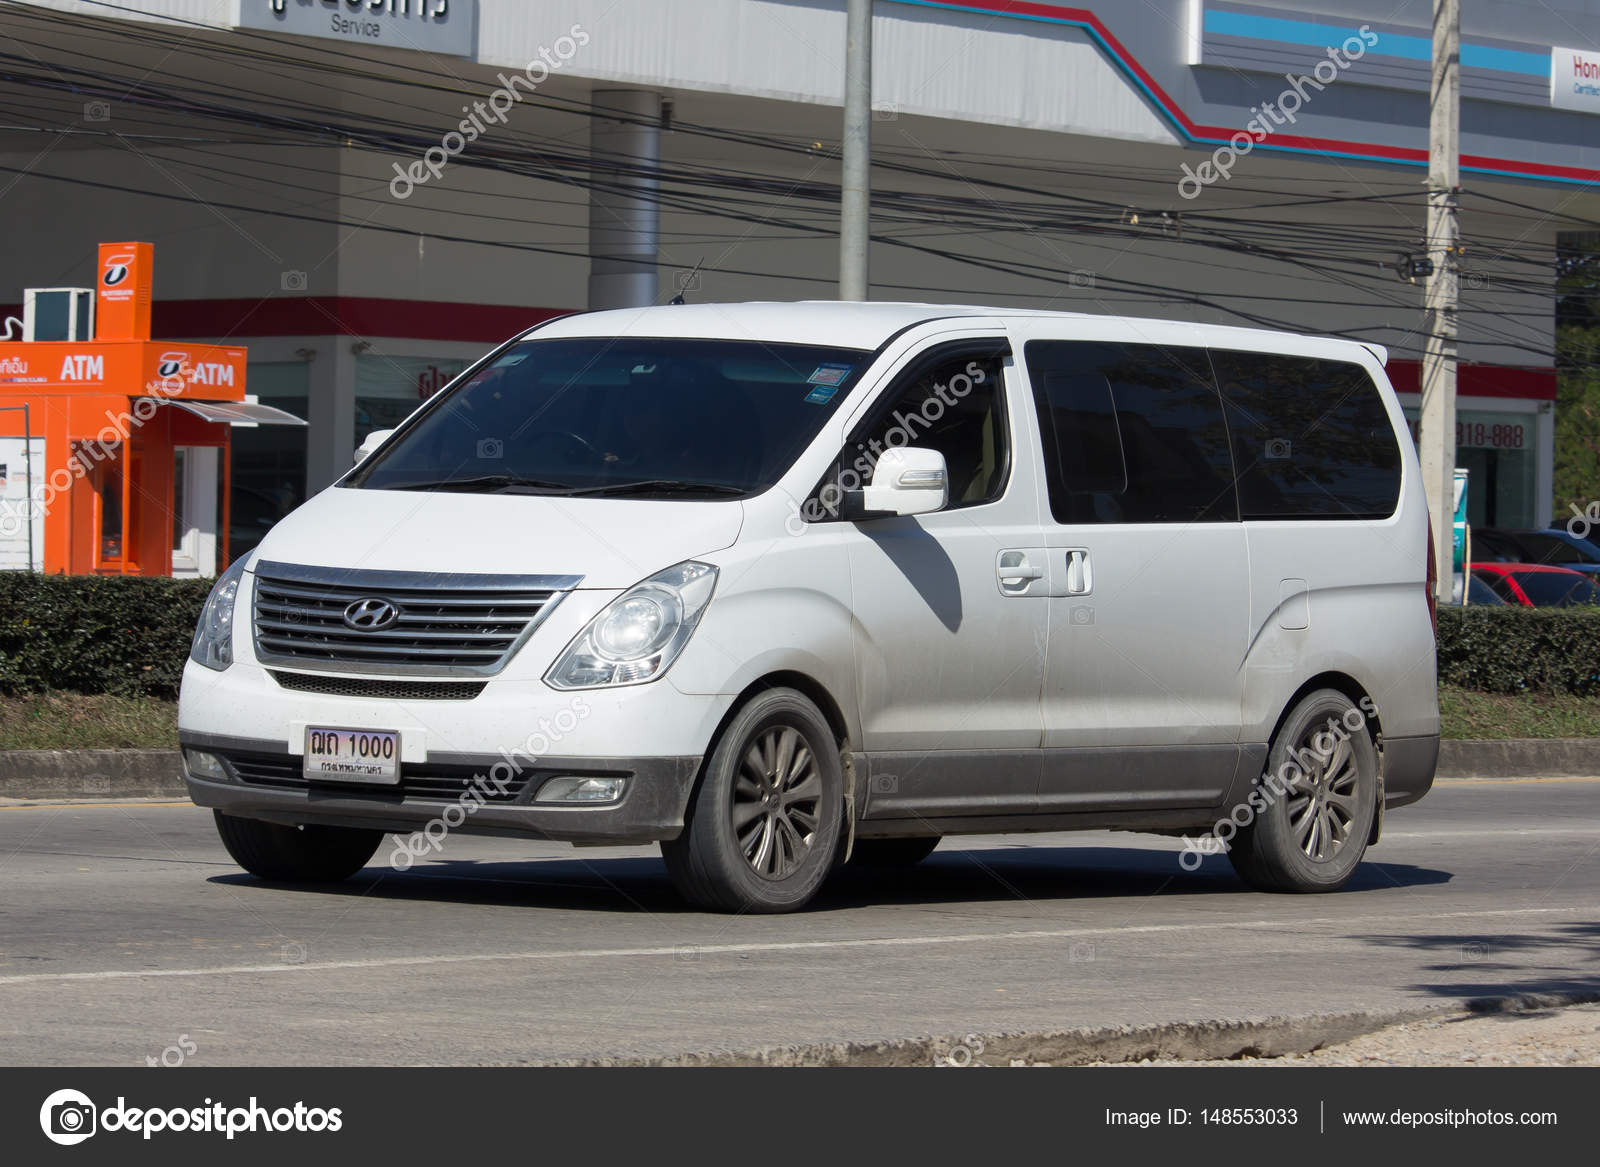 Luxury Van from Hyundai Korea. Hyundai H1. – Stock Editorial ...